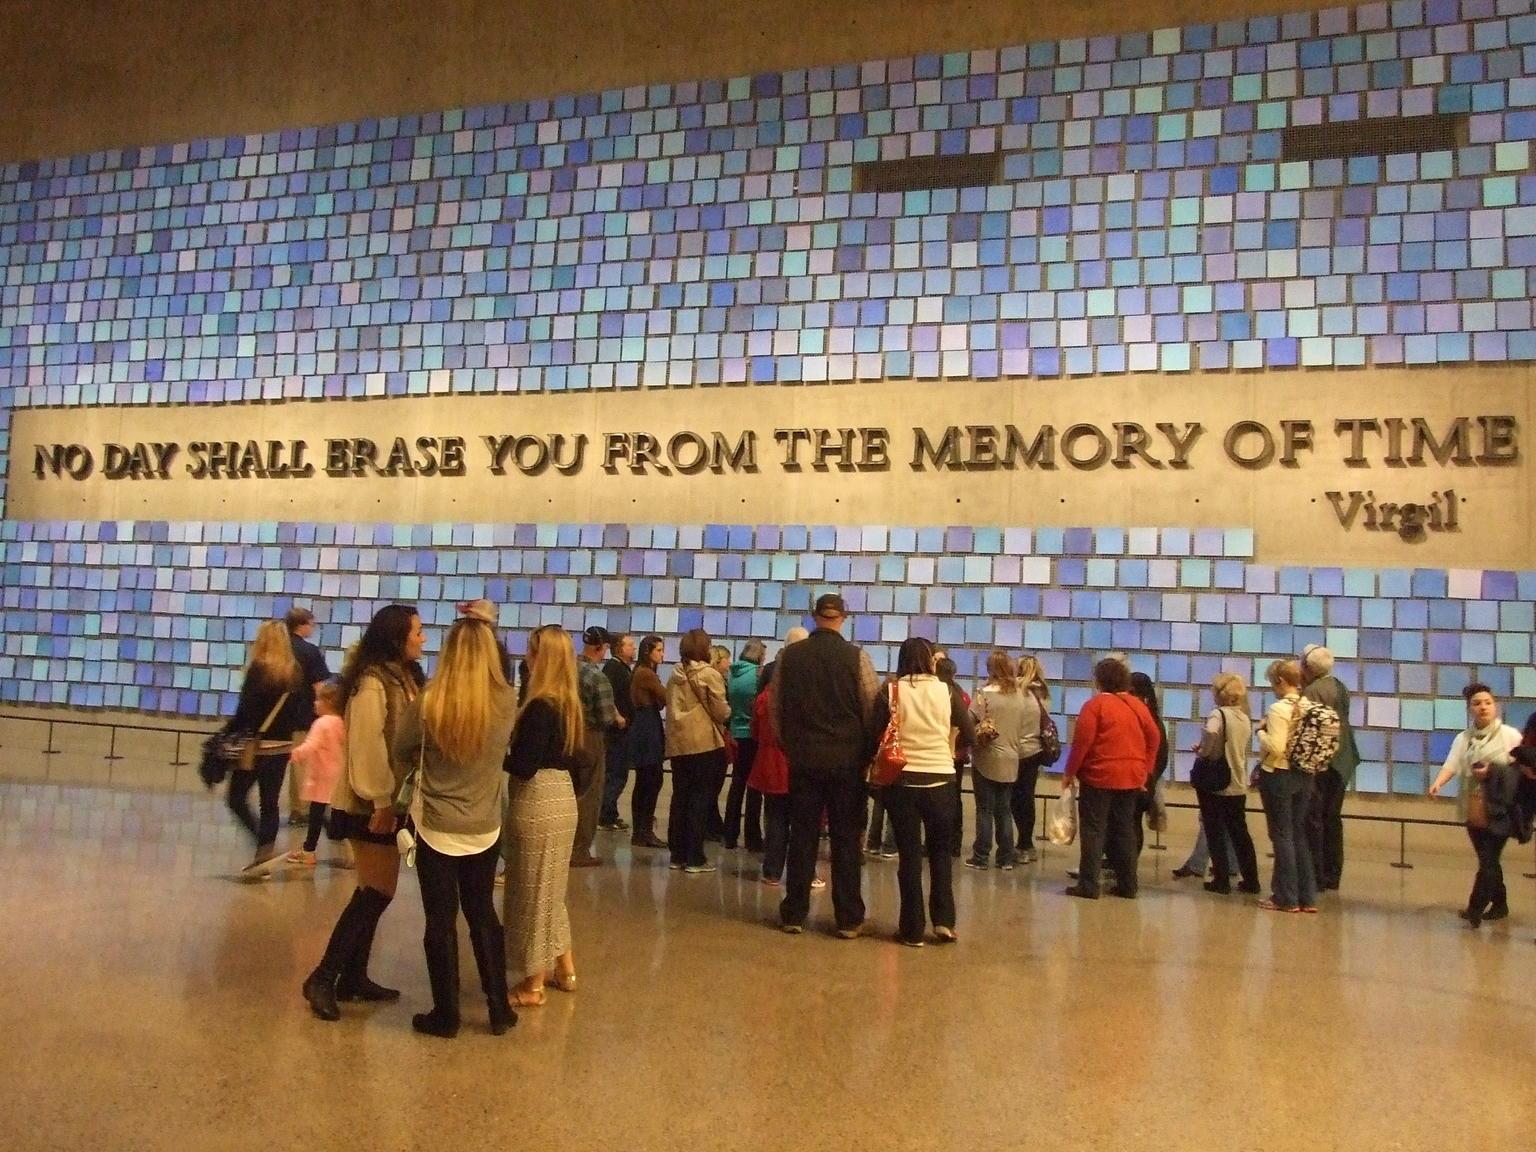 9/11 Memorial and Ground Zero Walking Tour with Optional 9/11 Museum Upgrade-走四方旅遊網